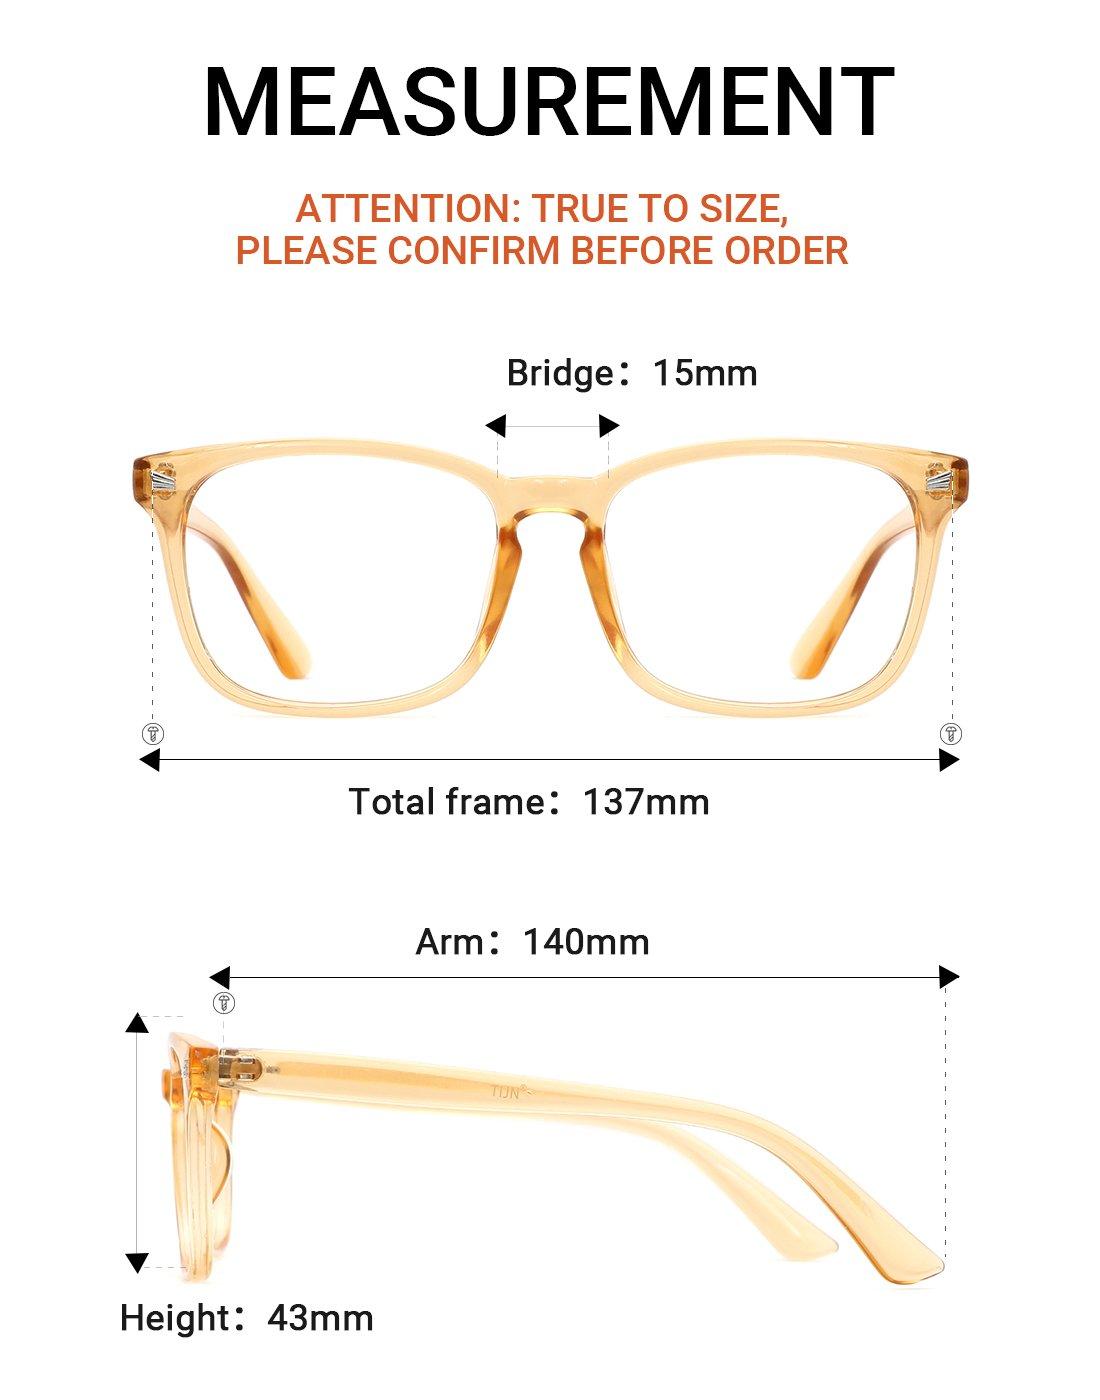 7aafe7deaf TIJN Unisex Stylish Square Non-prescription Eyeglasses Glasses Clear Lens  Eyewear 00005008